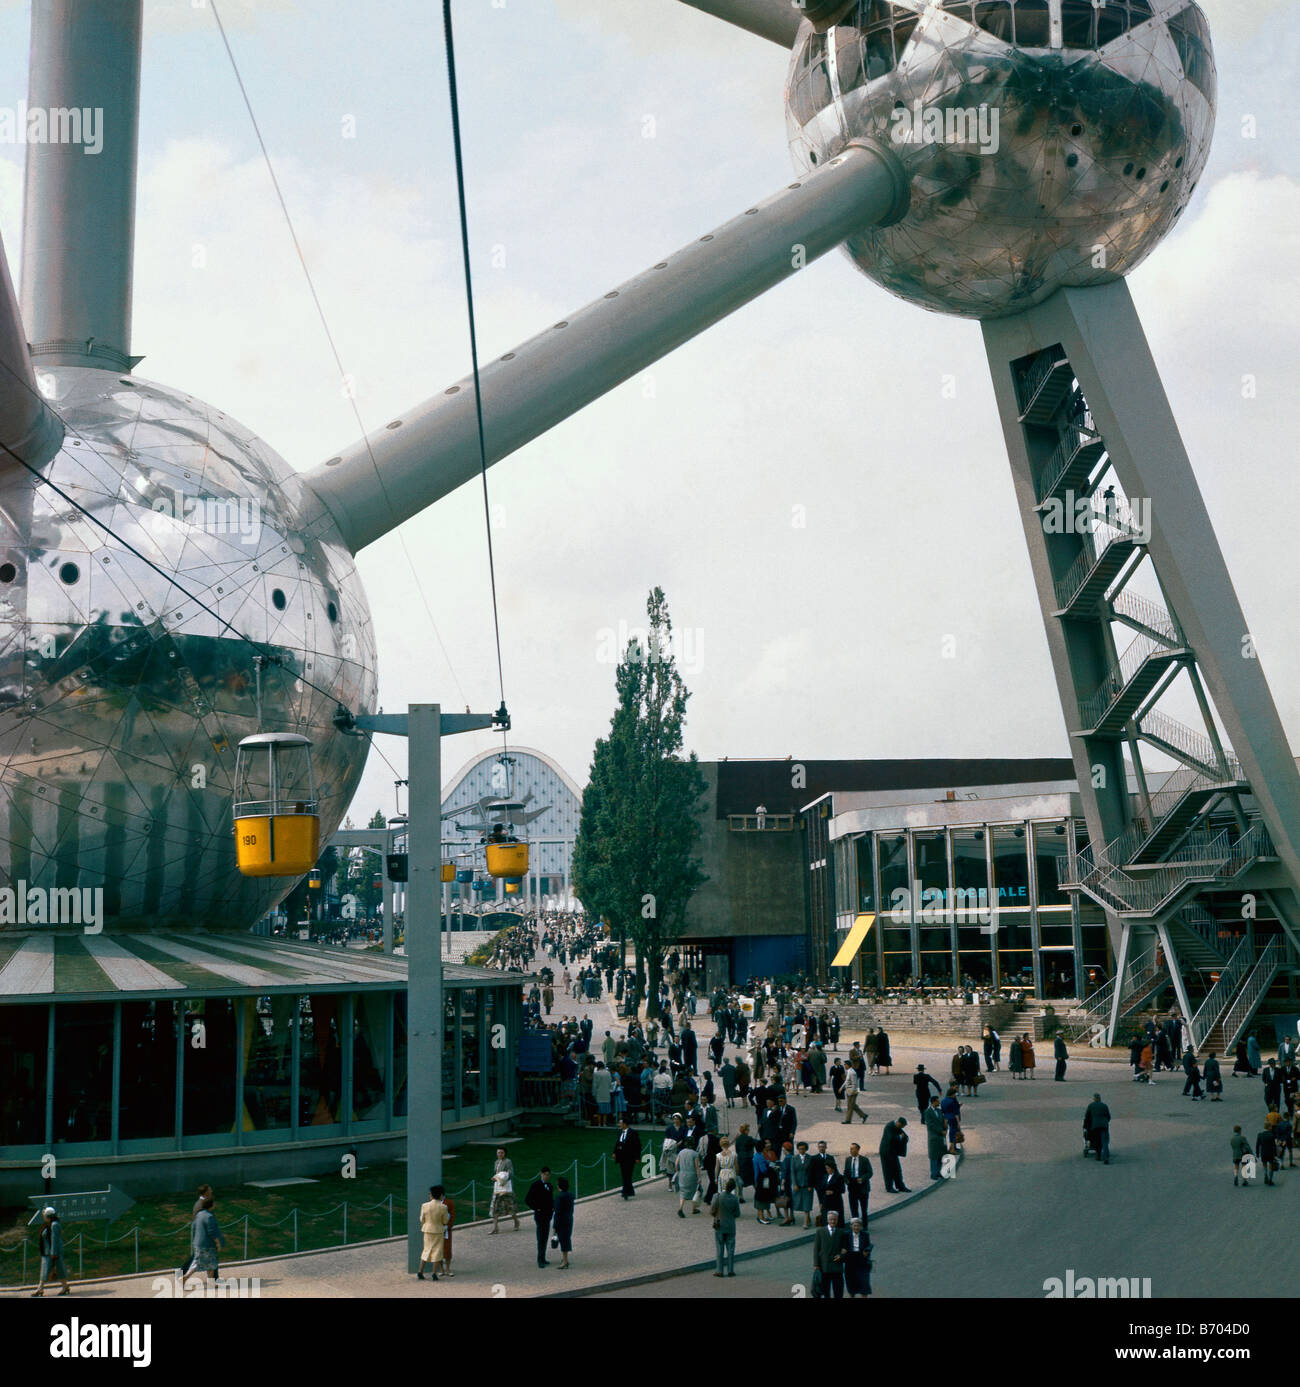 Expo 58, Heysel, Brussels, Belgium, 1958 - Stock Image